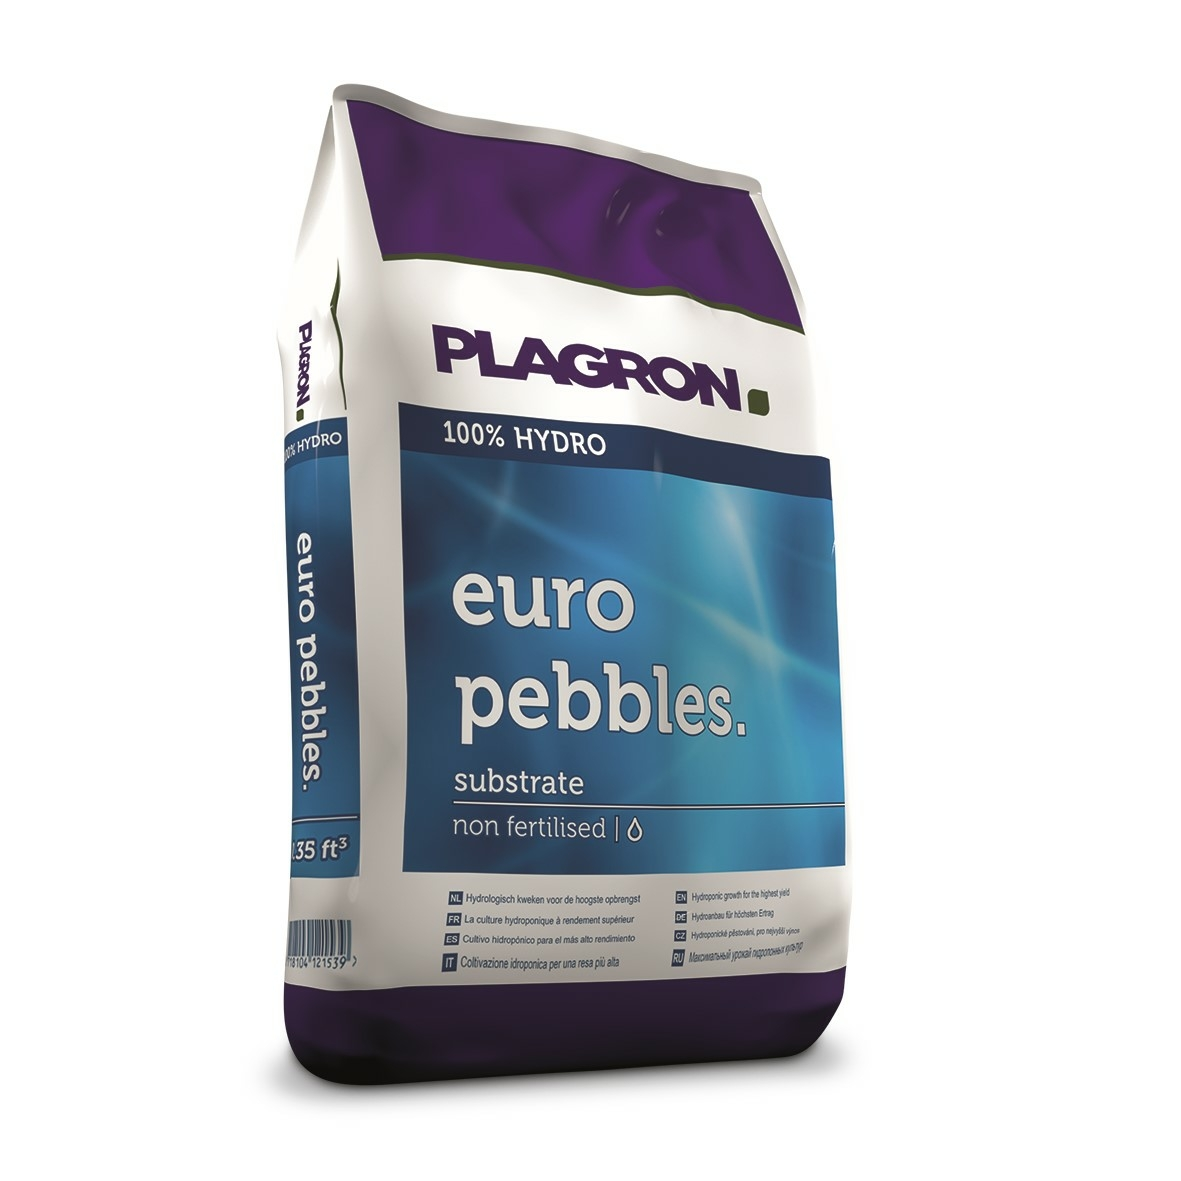 Plagron Euro pebbles agyaggolyó